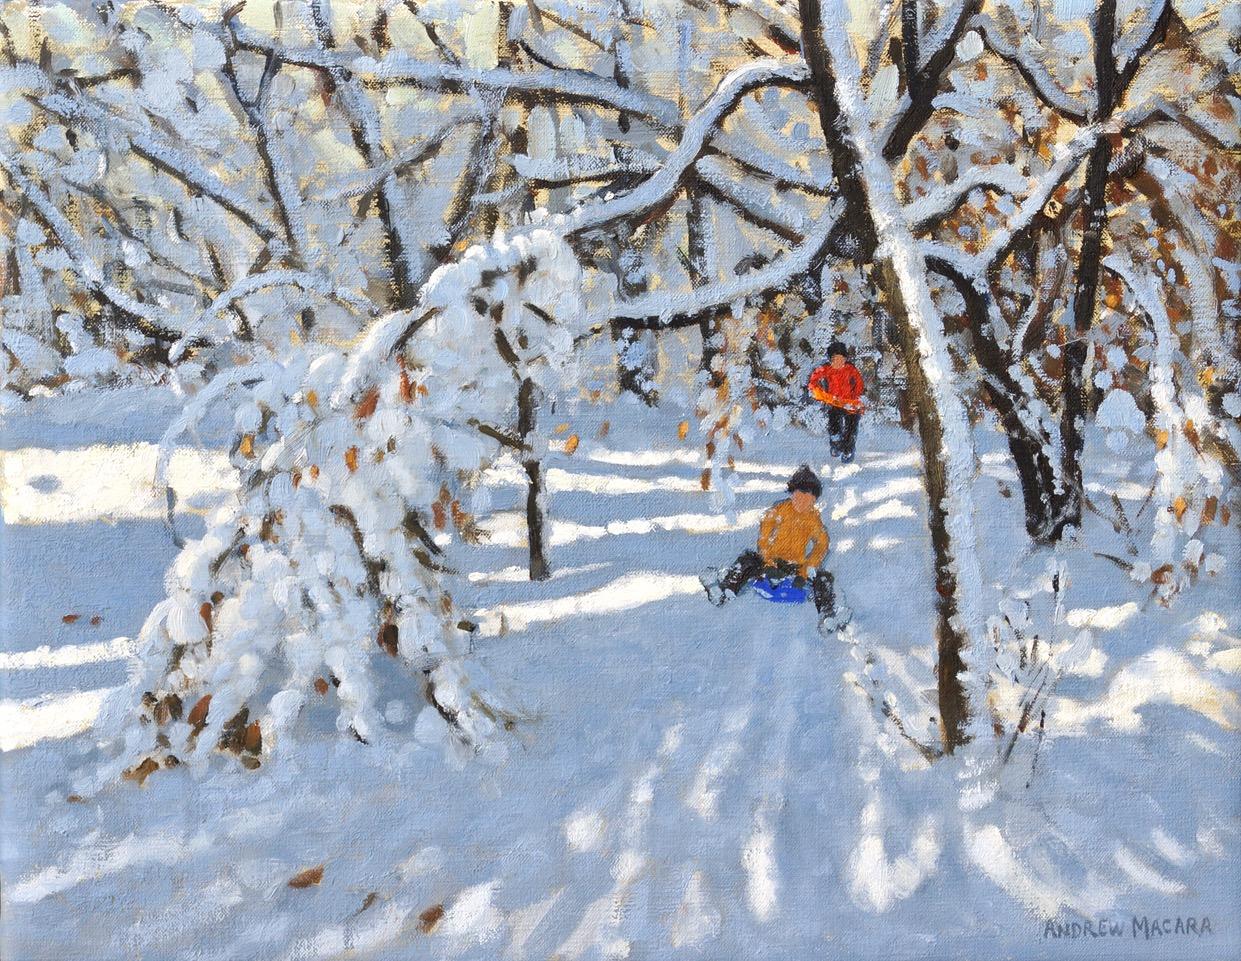 Andrew Macara, Two sledgers, Allestree Woods